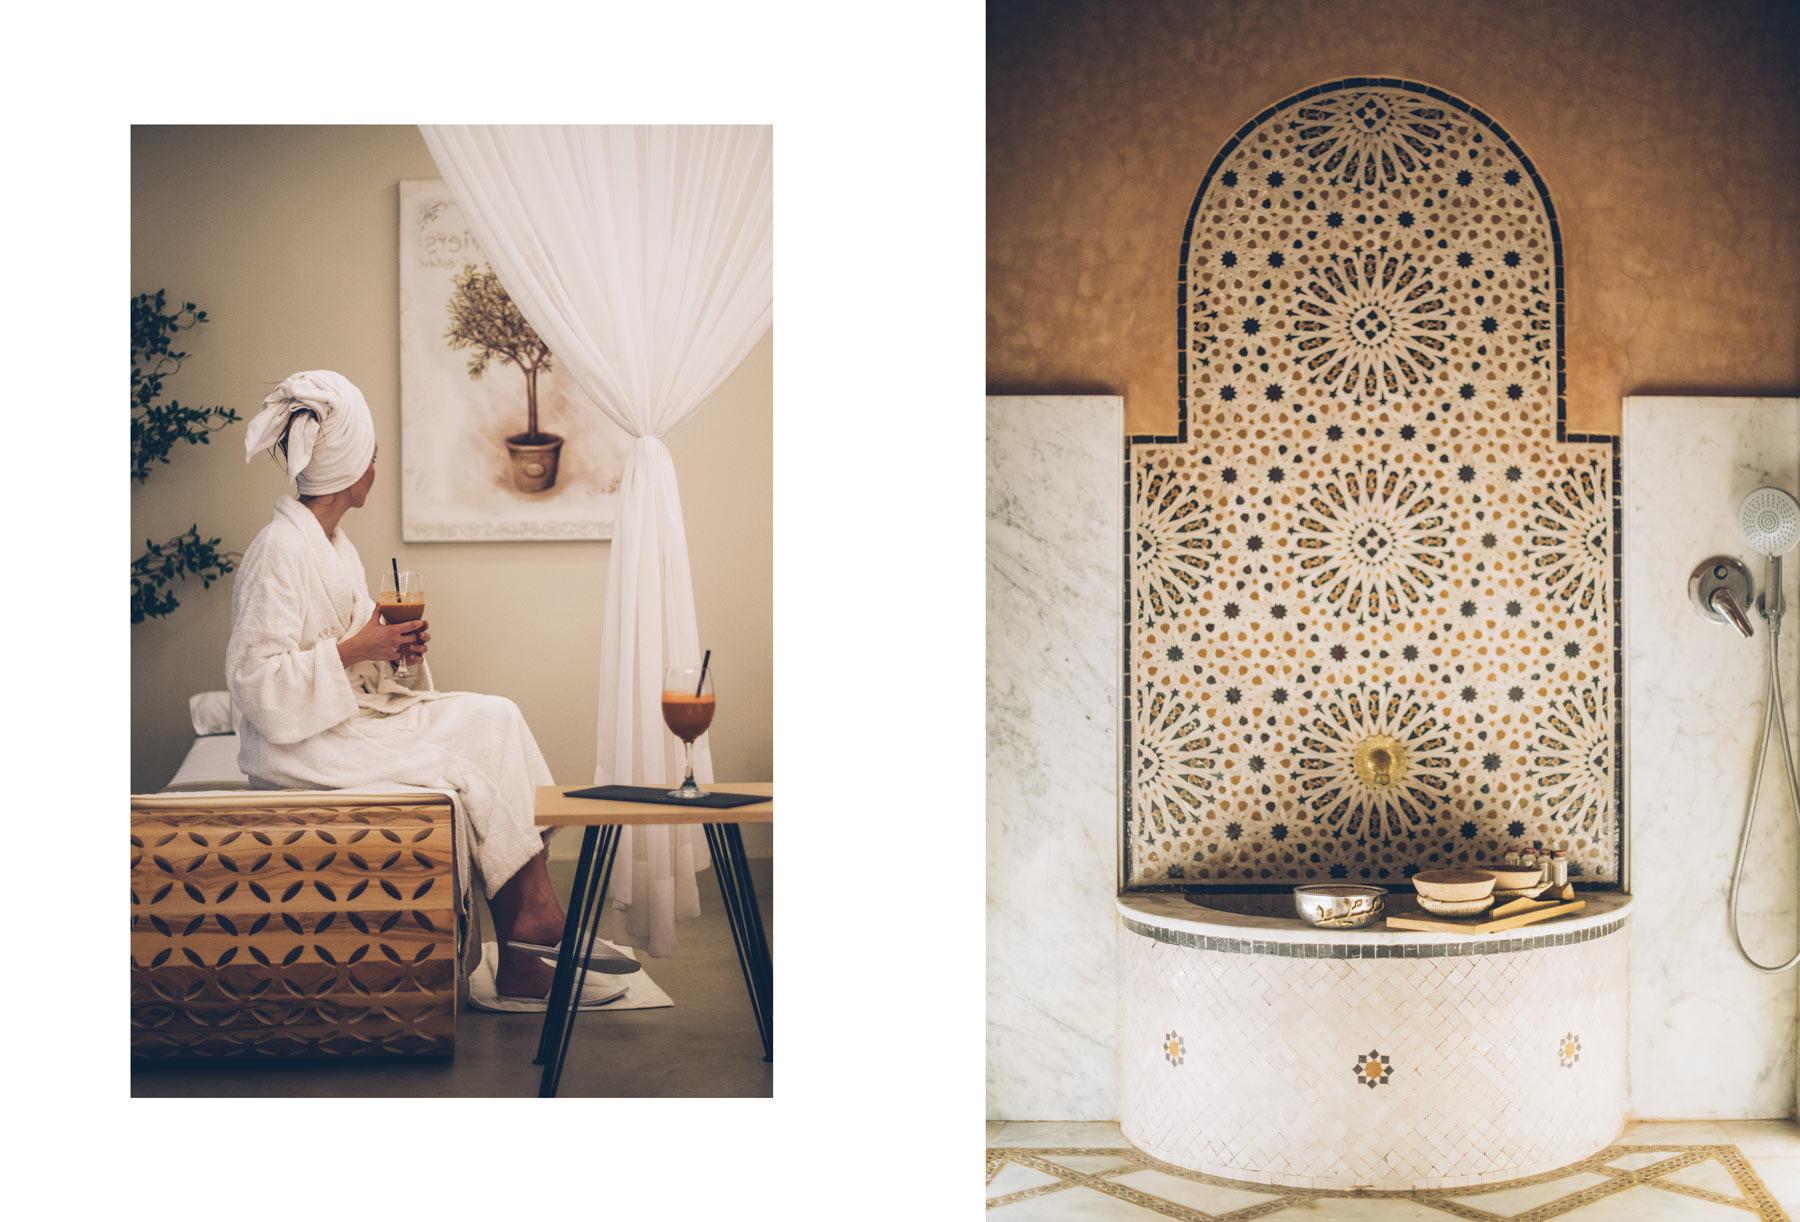 Spa du chateau Roslane, Maroc